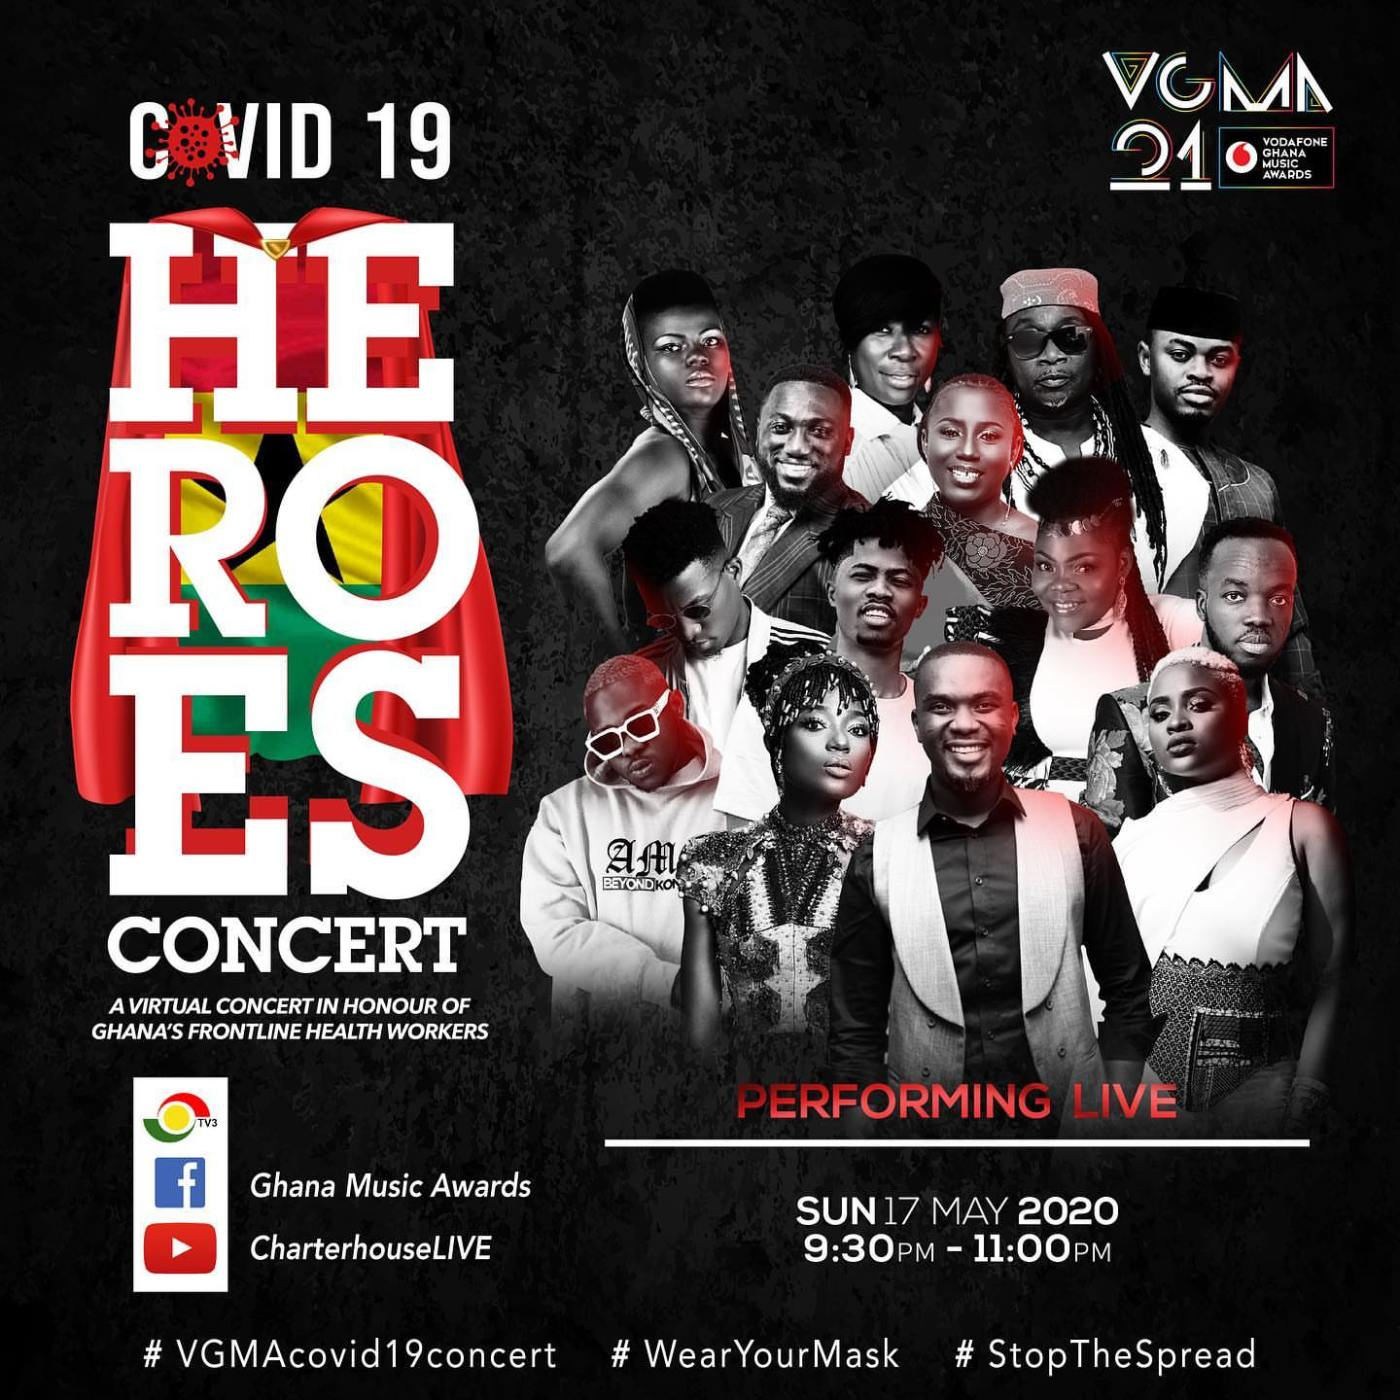 VGMA Covid-19 Concert - Heroes Concert